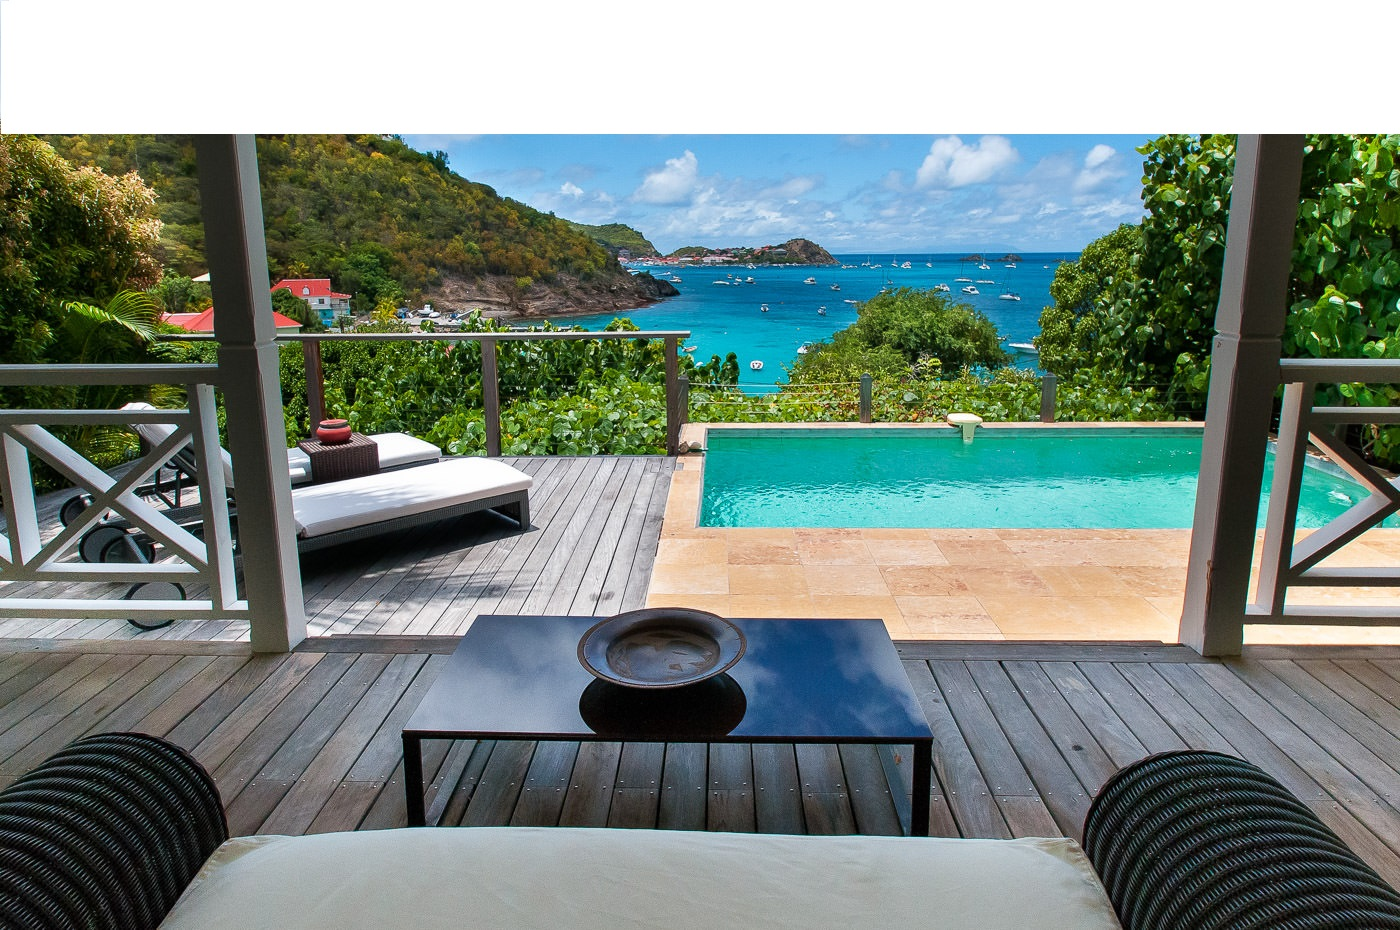 Location st barth l my bungalow avec piscine priv e et - Bungalow guadeloupe piscine privee ...